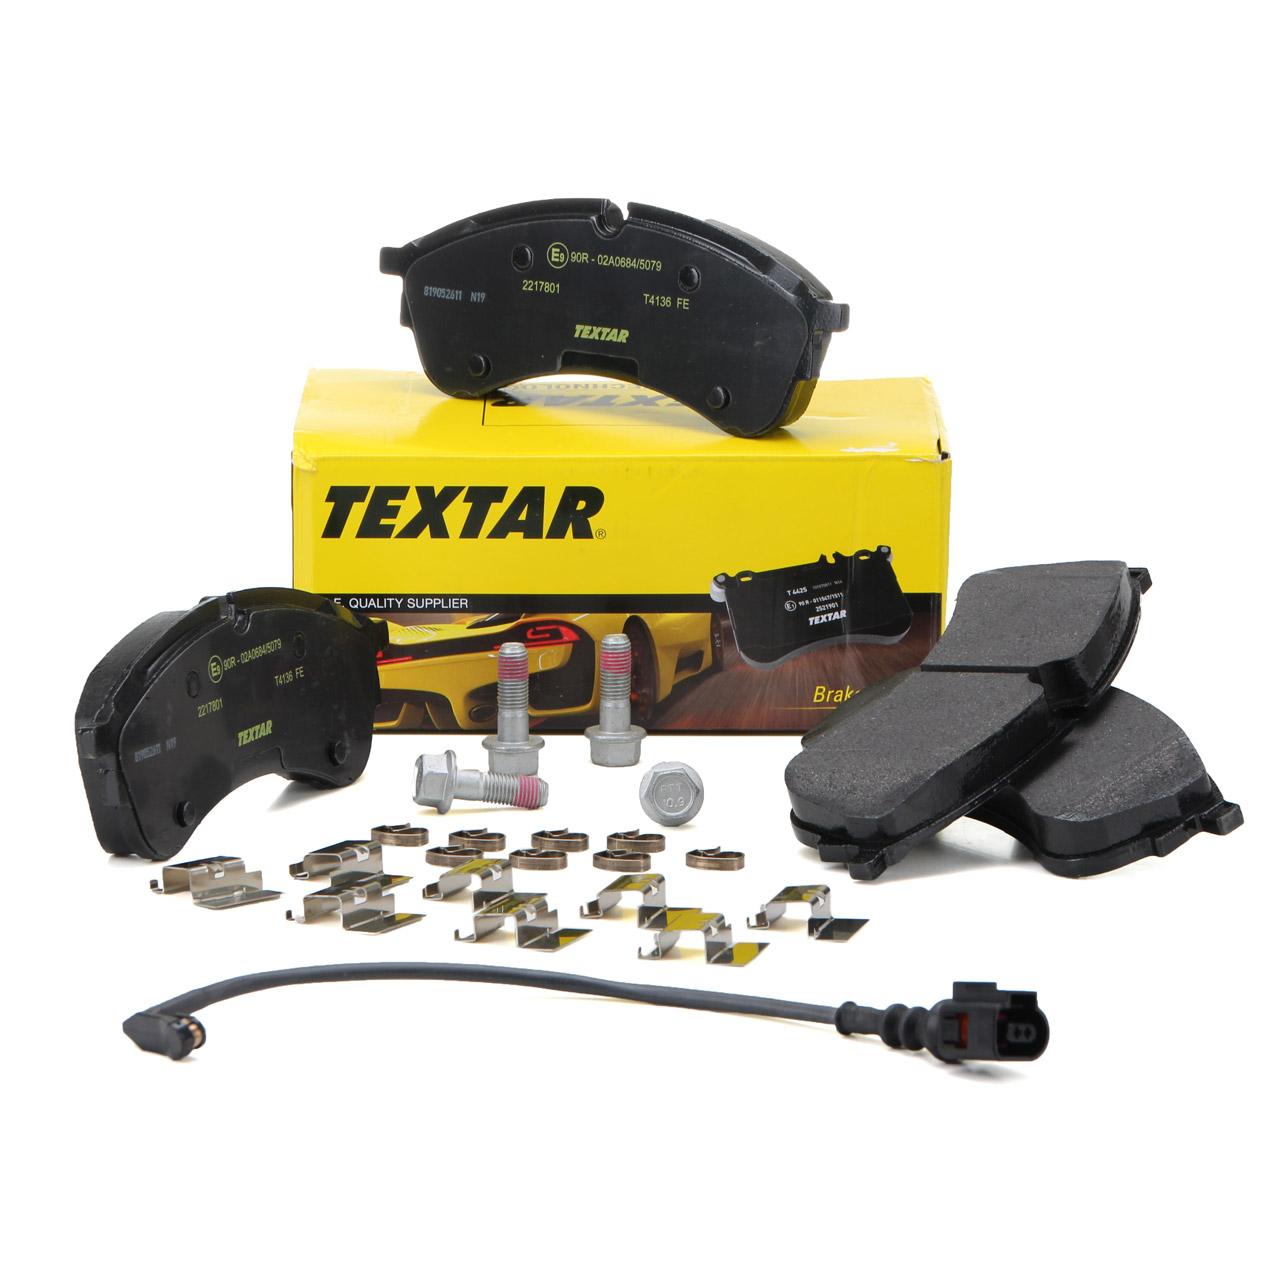 TEXTAR 2217801 Bremsbeläge + Wako MAN TGE VW Crafter (SY SX SZ) 1LB 1LC vorne